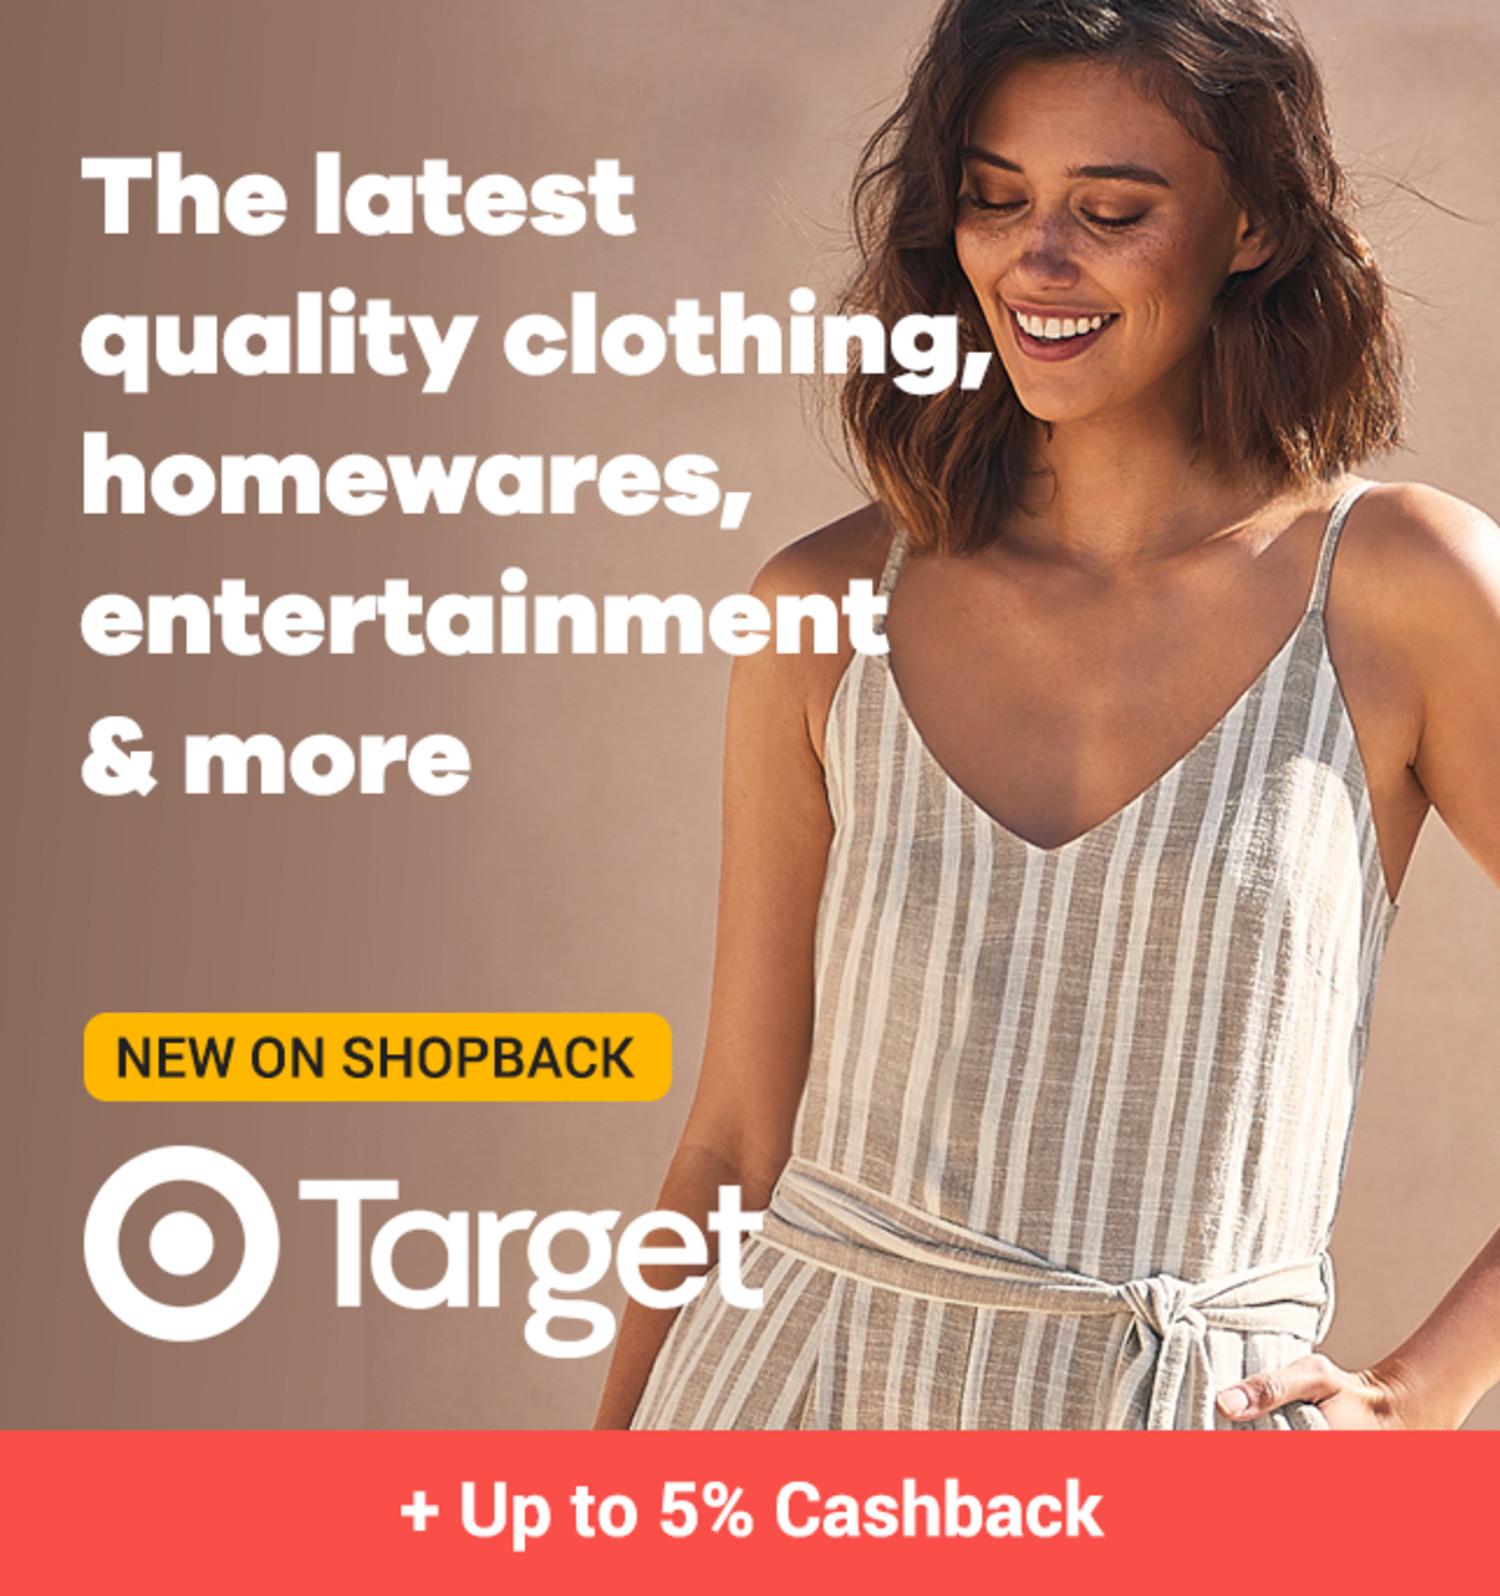 Target - Up to 5% Cashback - New